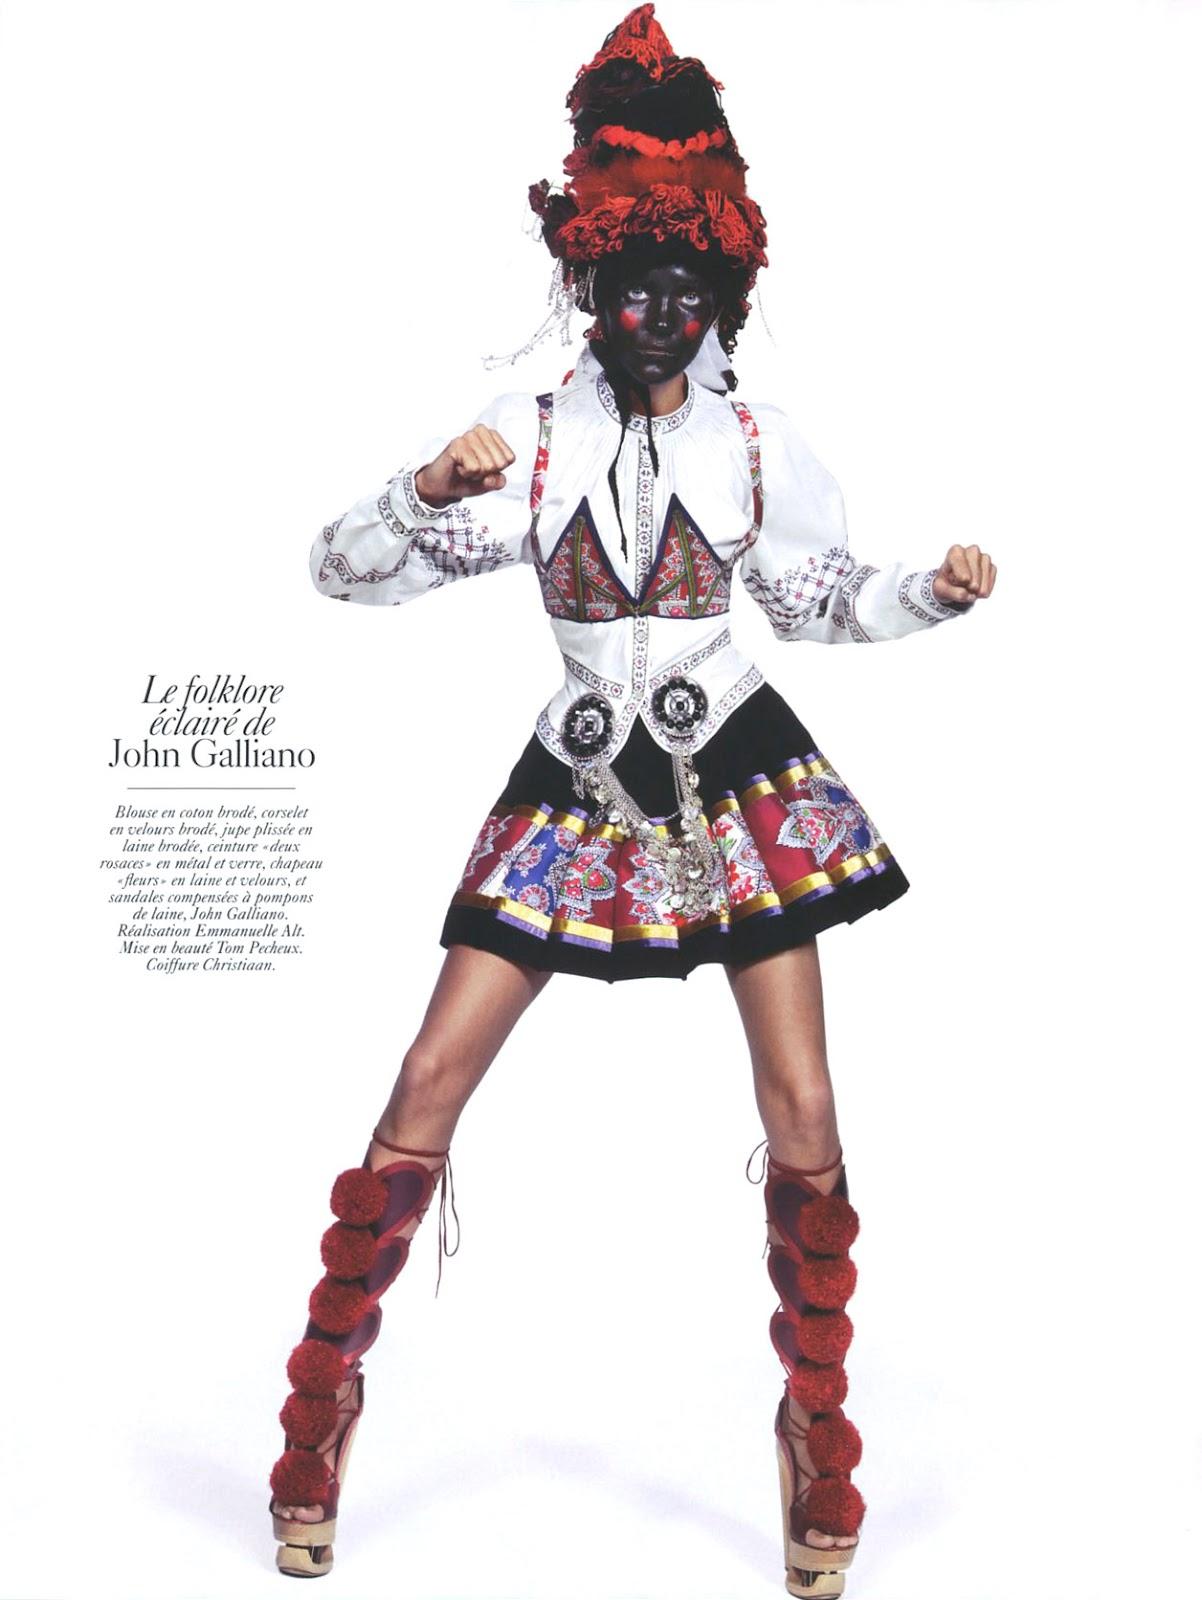 http://4.bp.blogspot.com/-mLpjT7e0lRg/T2sLuof_SfI/AAAAAAAAFj4/C2Bvf85gcj0/s1600/2009+08+Vogue+Paris+Ph+Inez+Van+Lamsveerde+&+Vinoodh+Matadin+063+Anja+Rubik.jpg